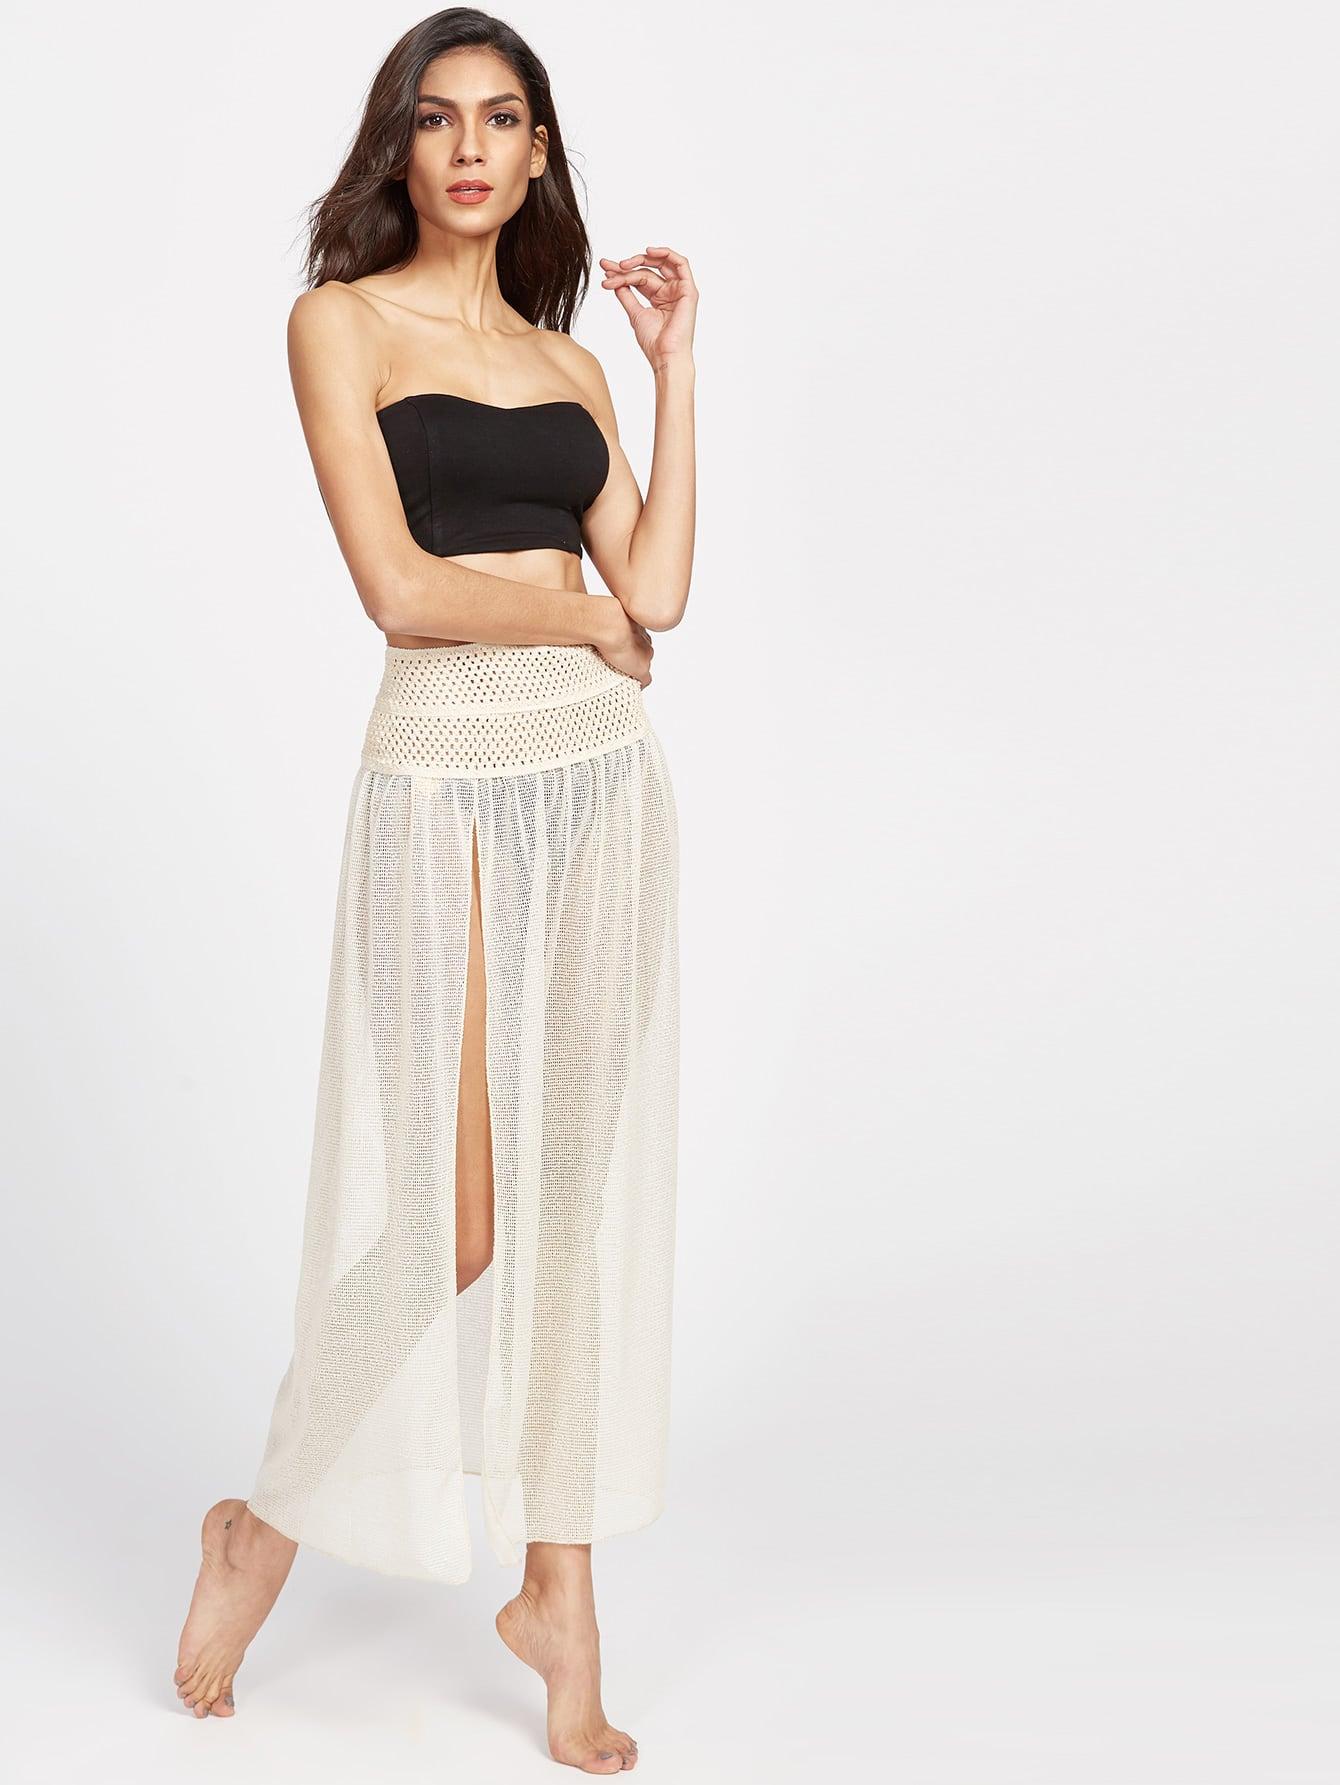 Beige Eyelet Lace High Slit Two Way Wear Skirt